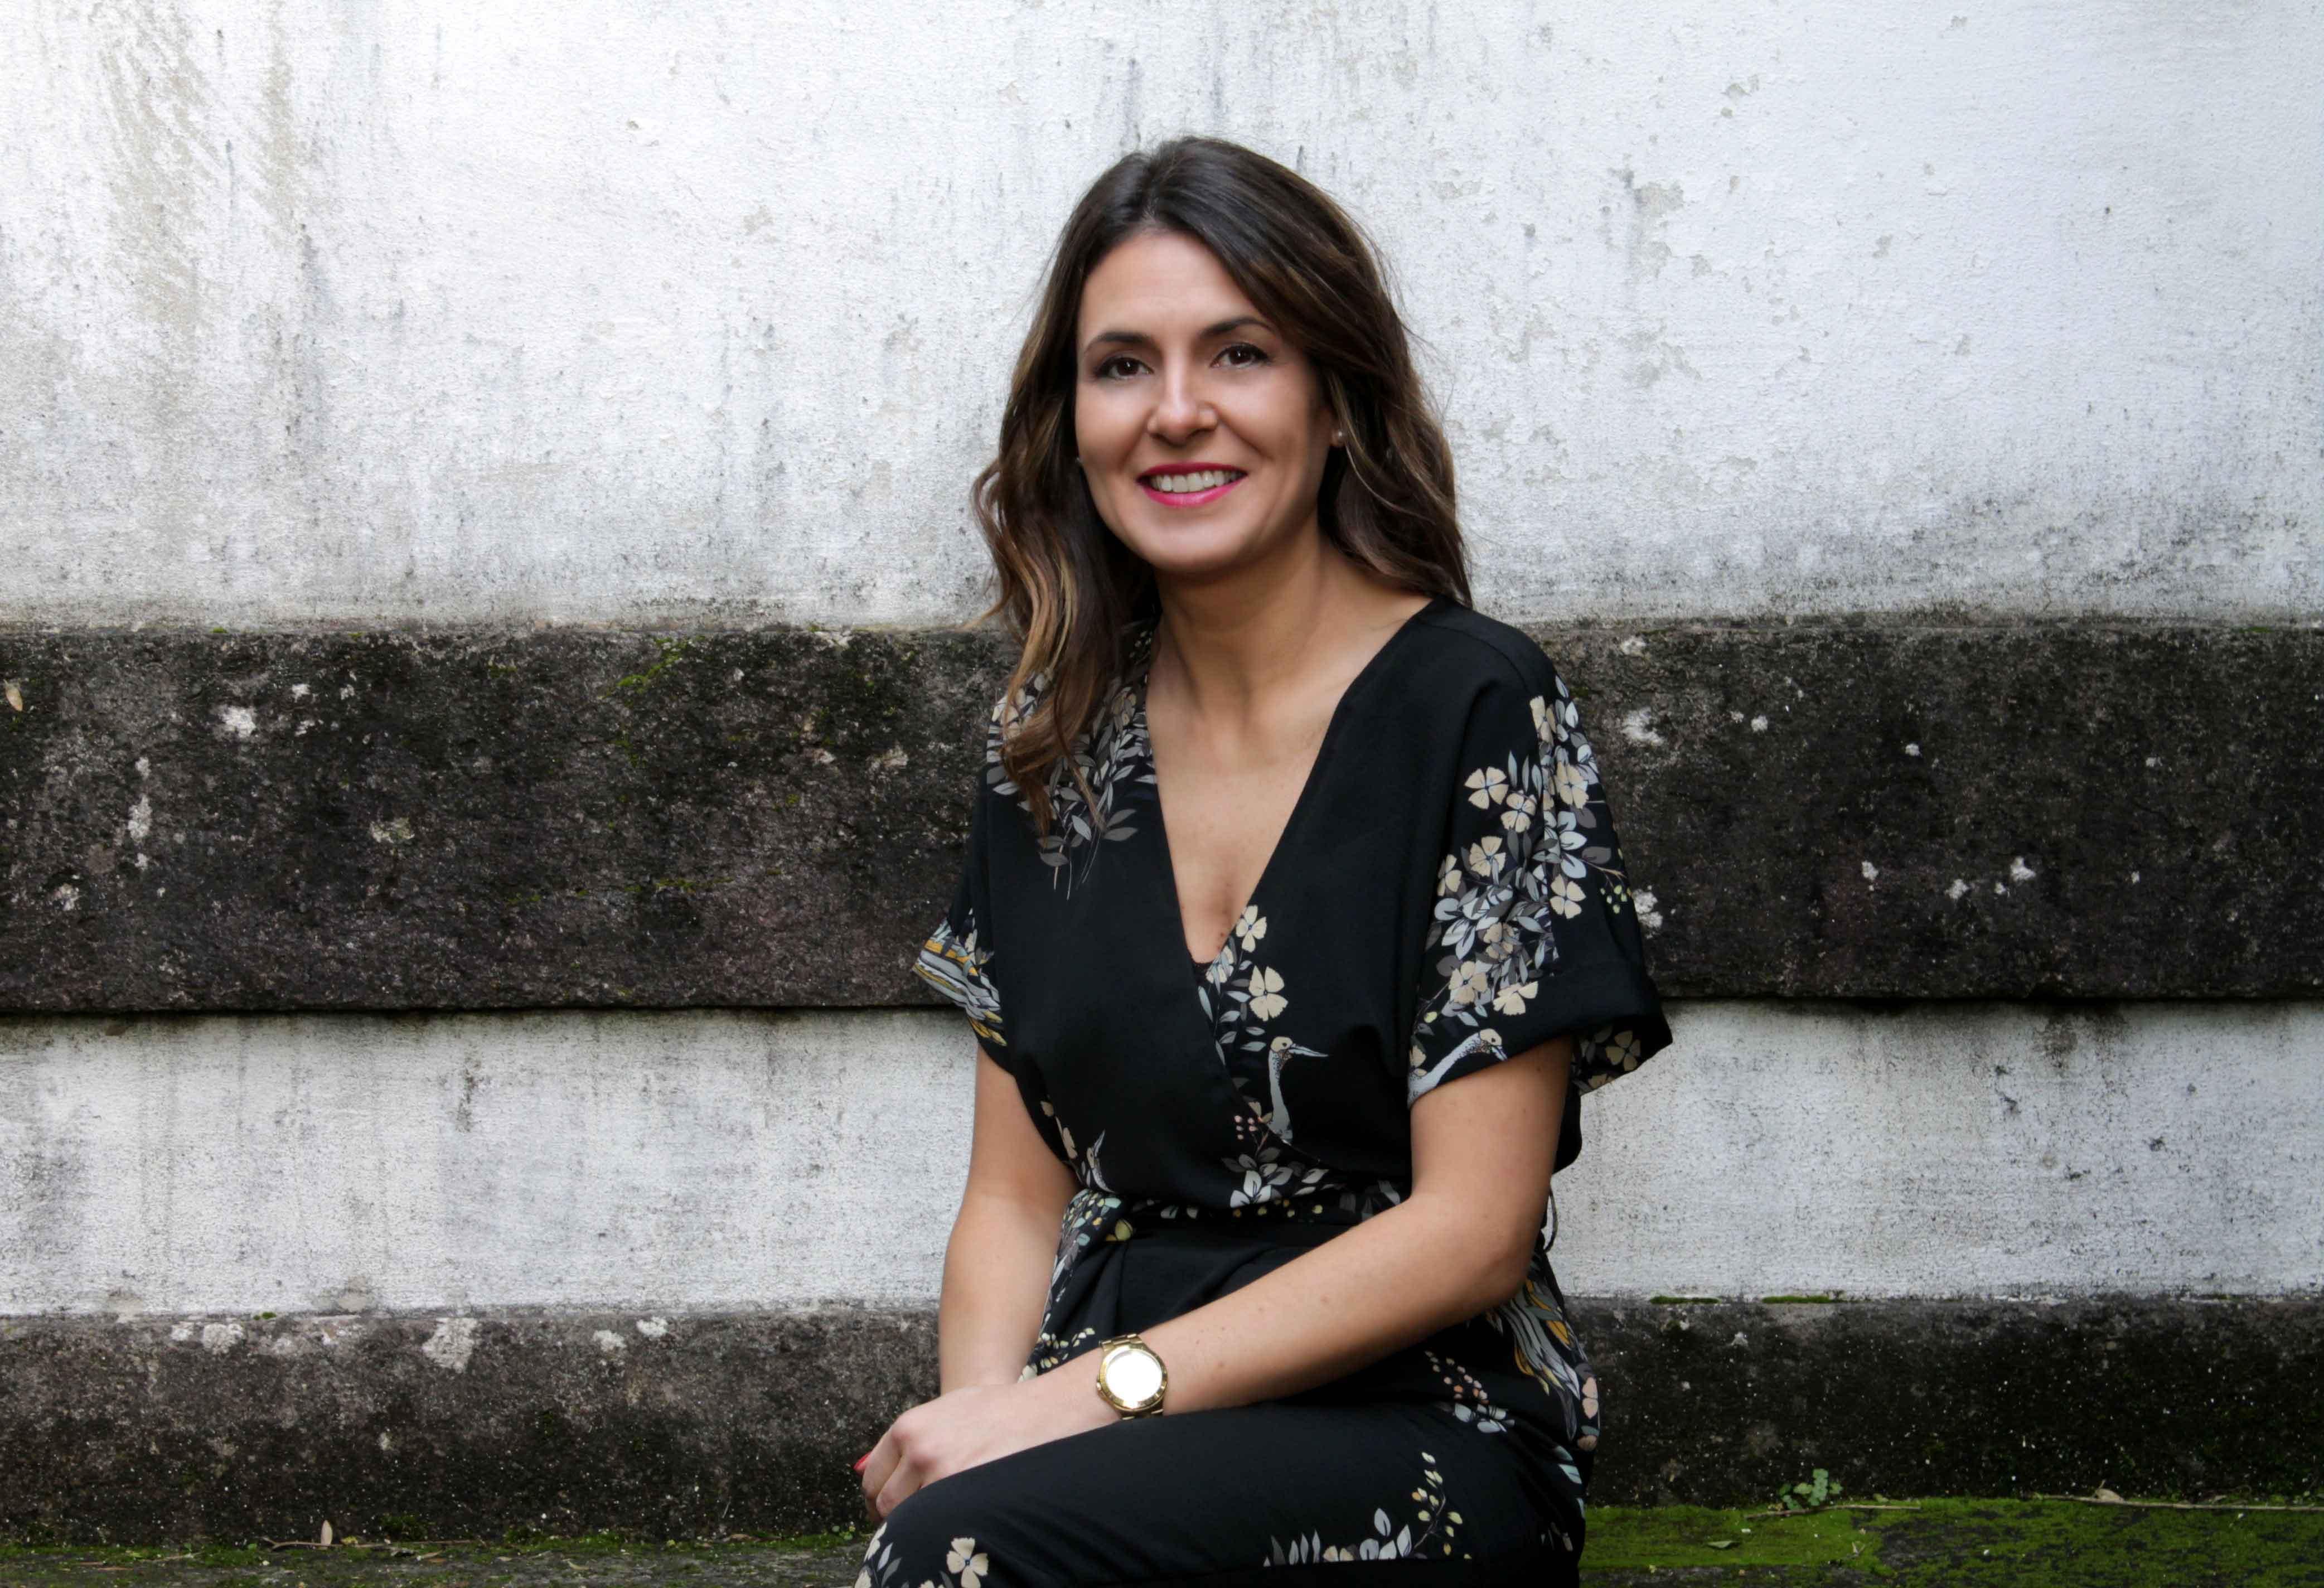 Pilar Senín Vilariño - Oficiante de ceremonias